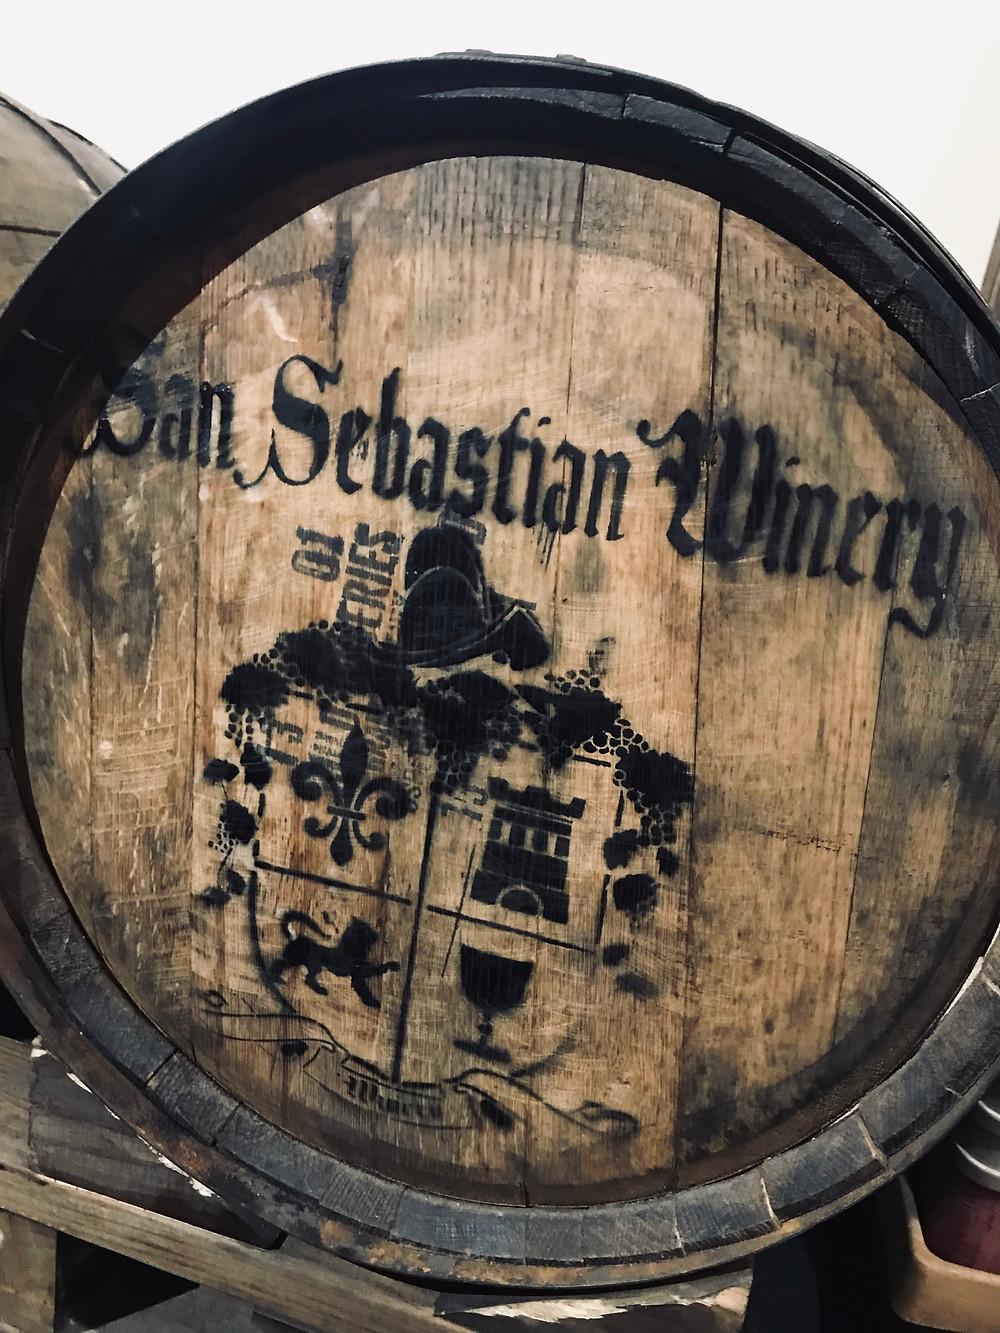 st-augustine-winery-san-sebastian